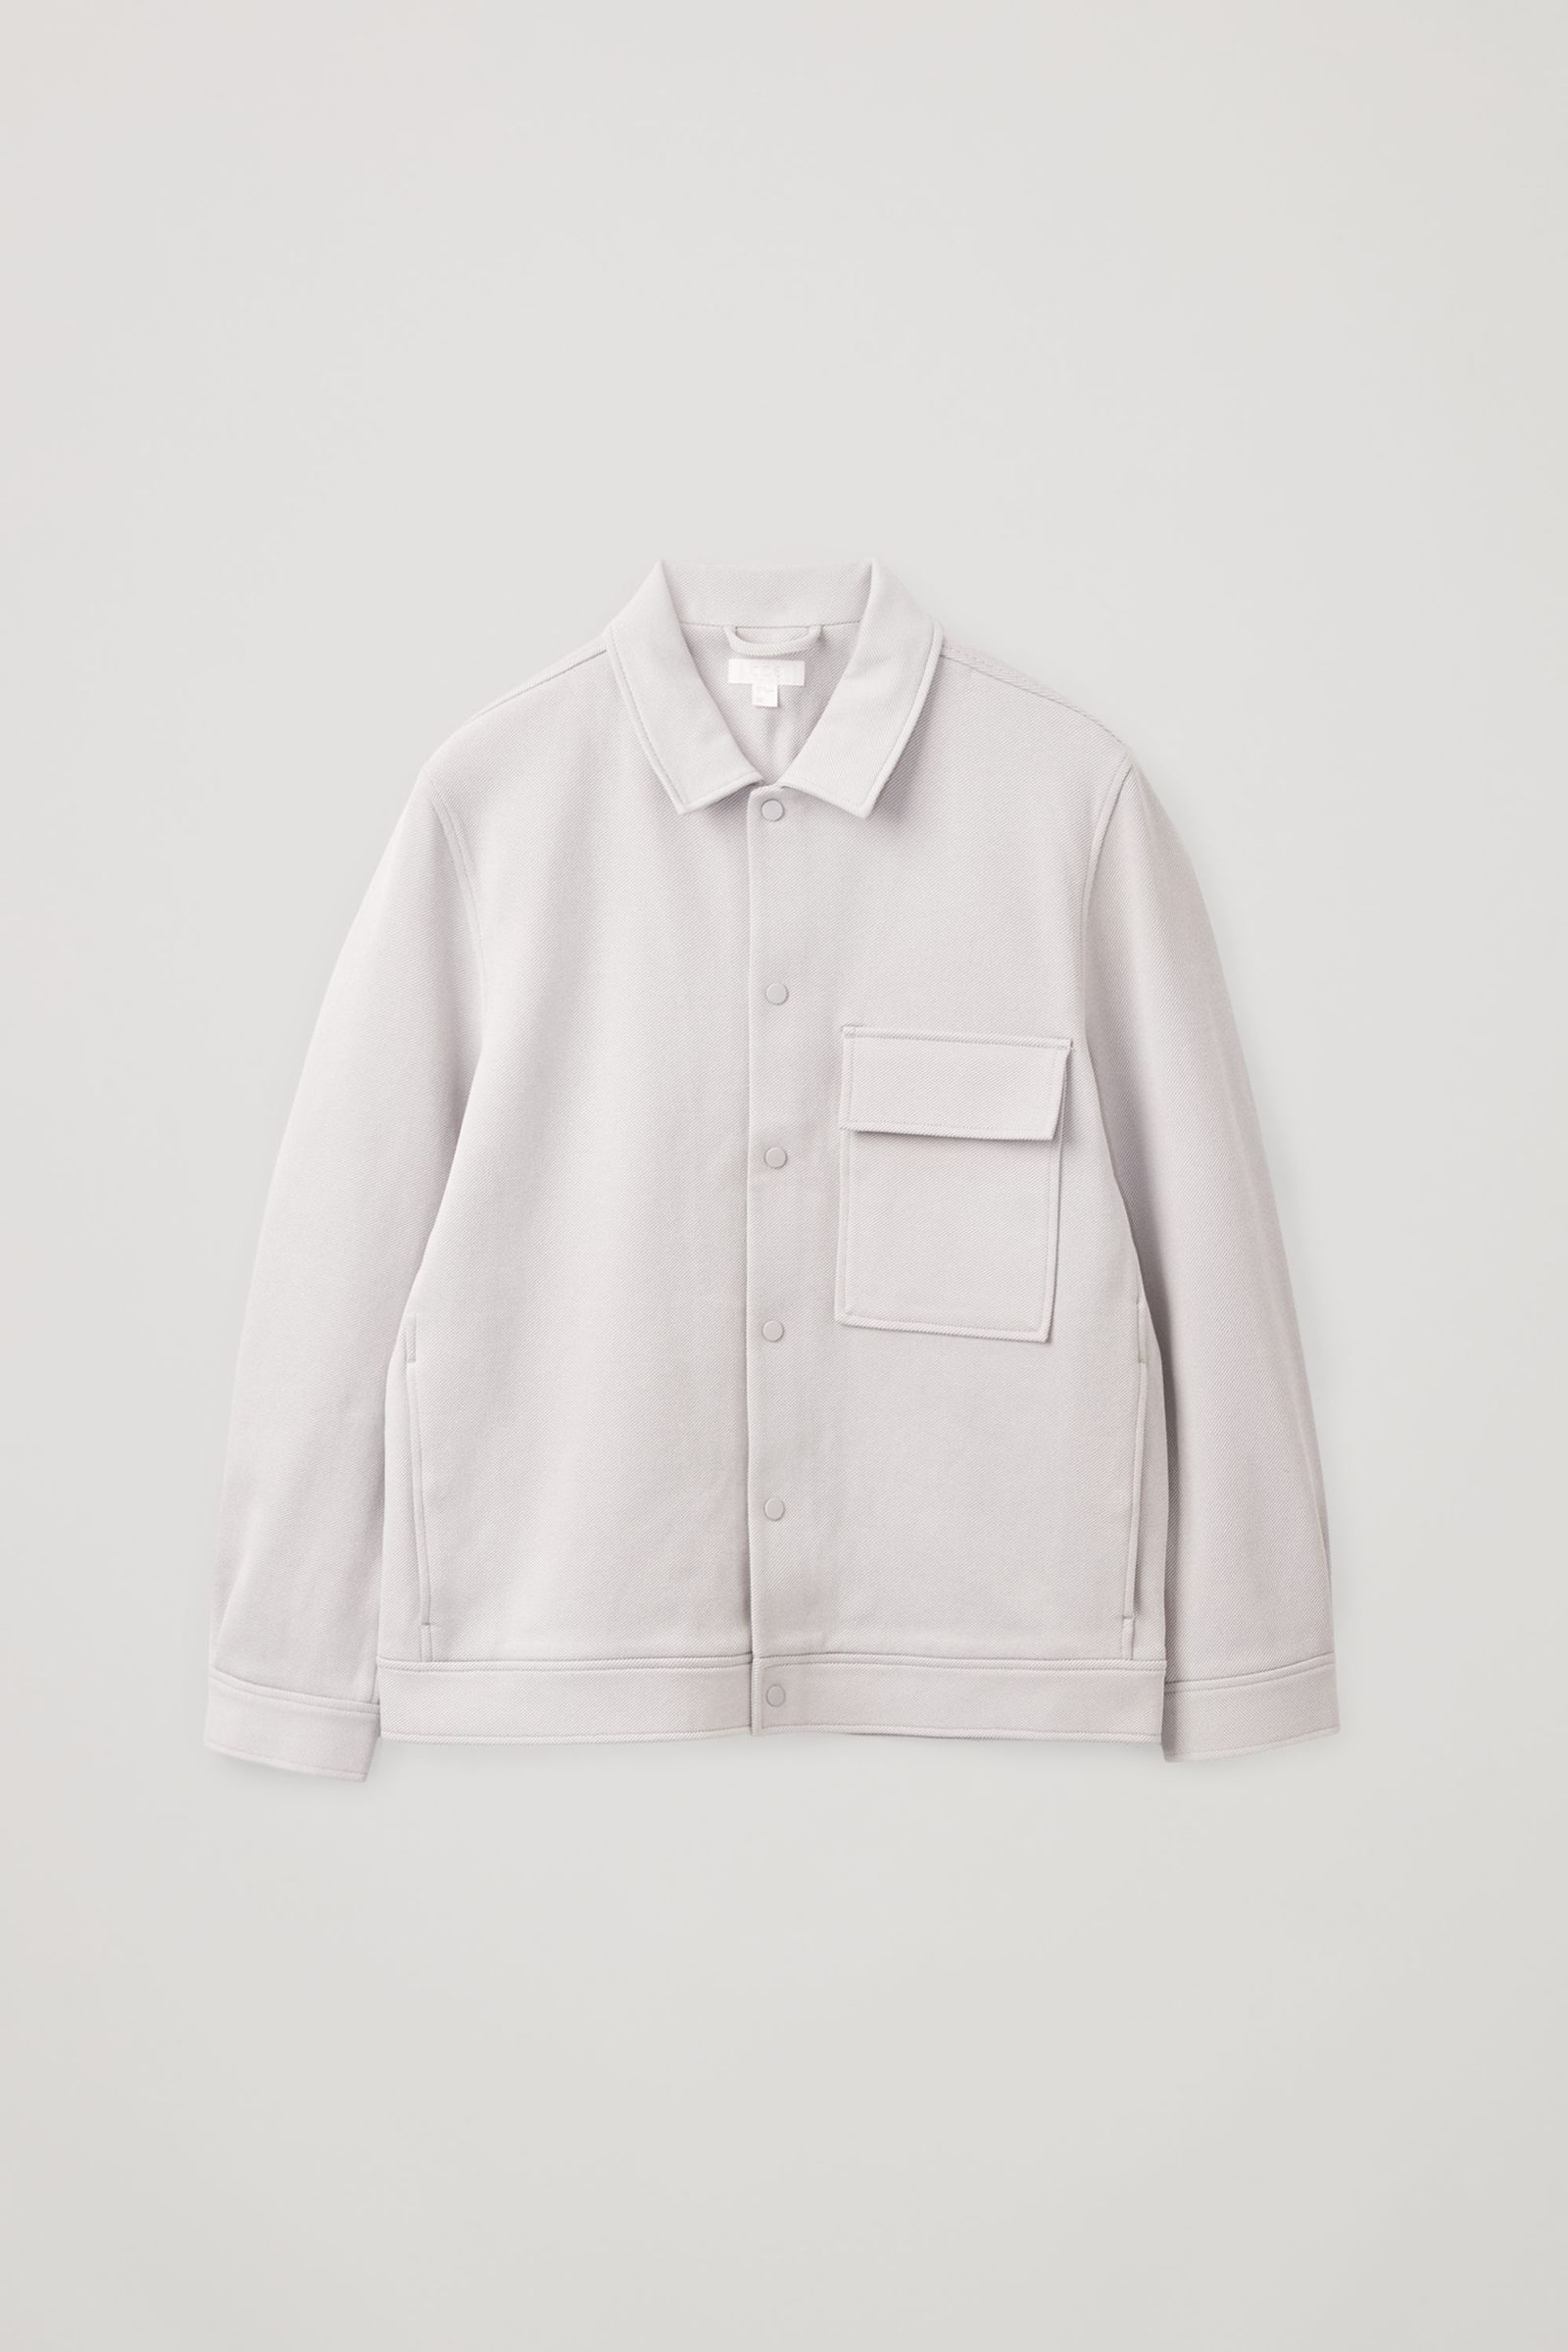 COS 코튼 트윌 셔츠 재킷의 그레이컬러 Product입니다.